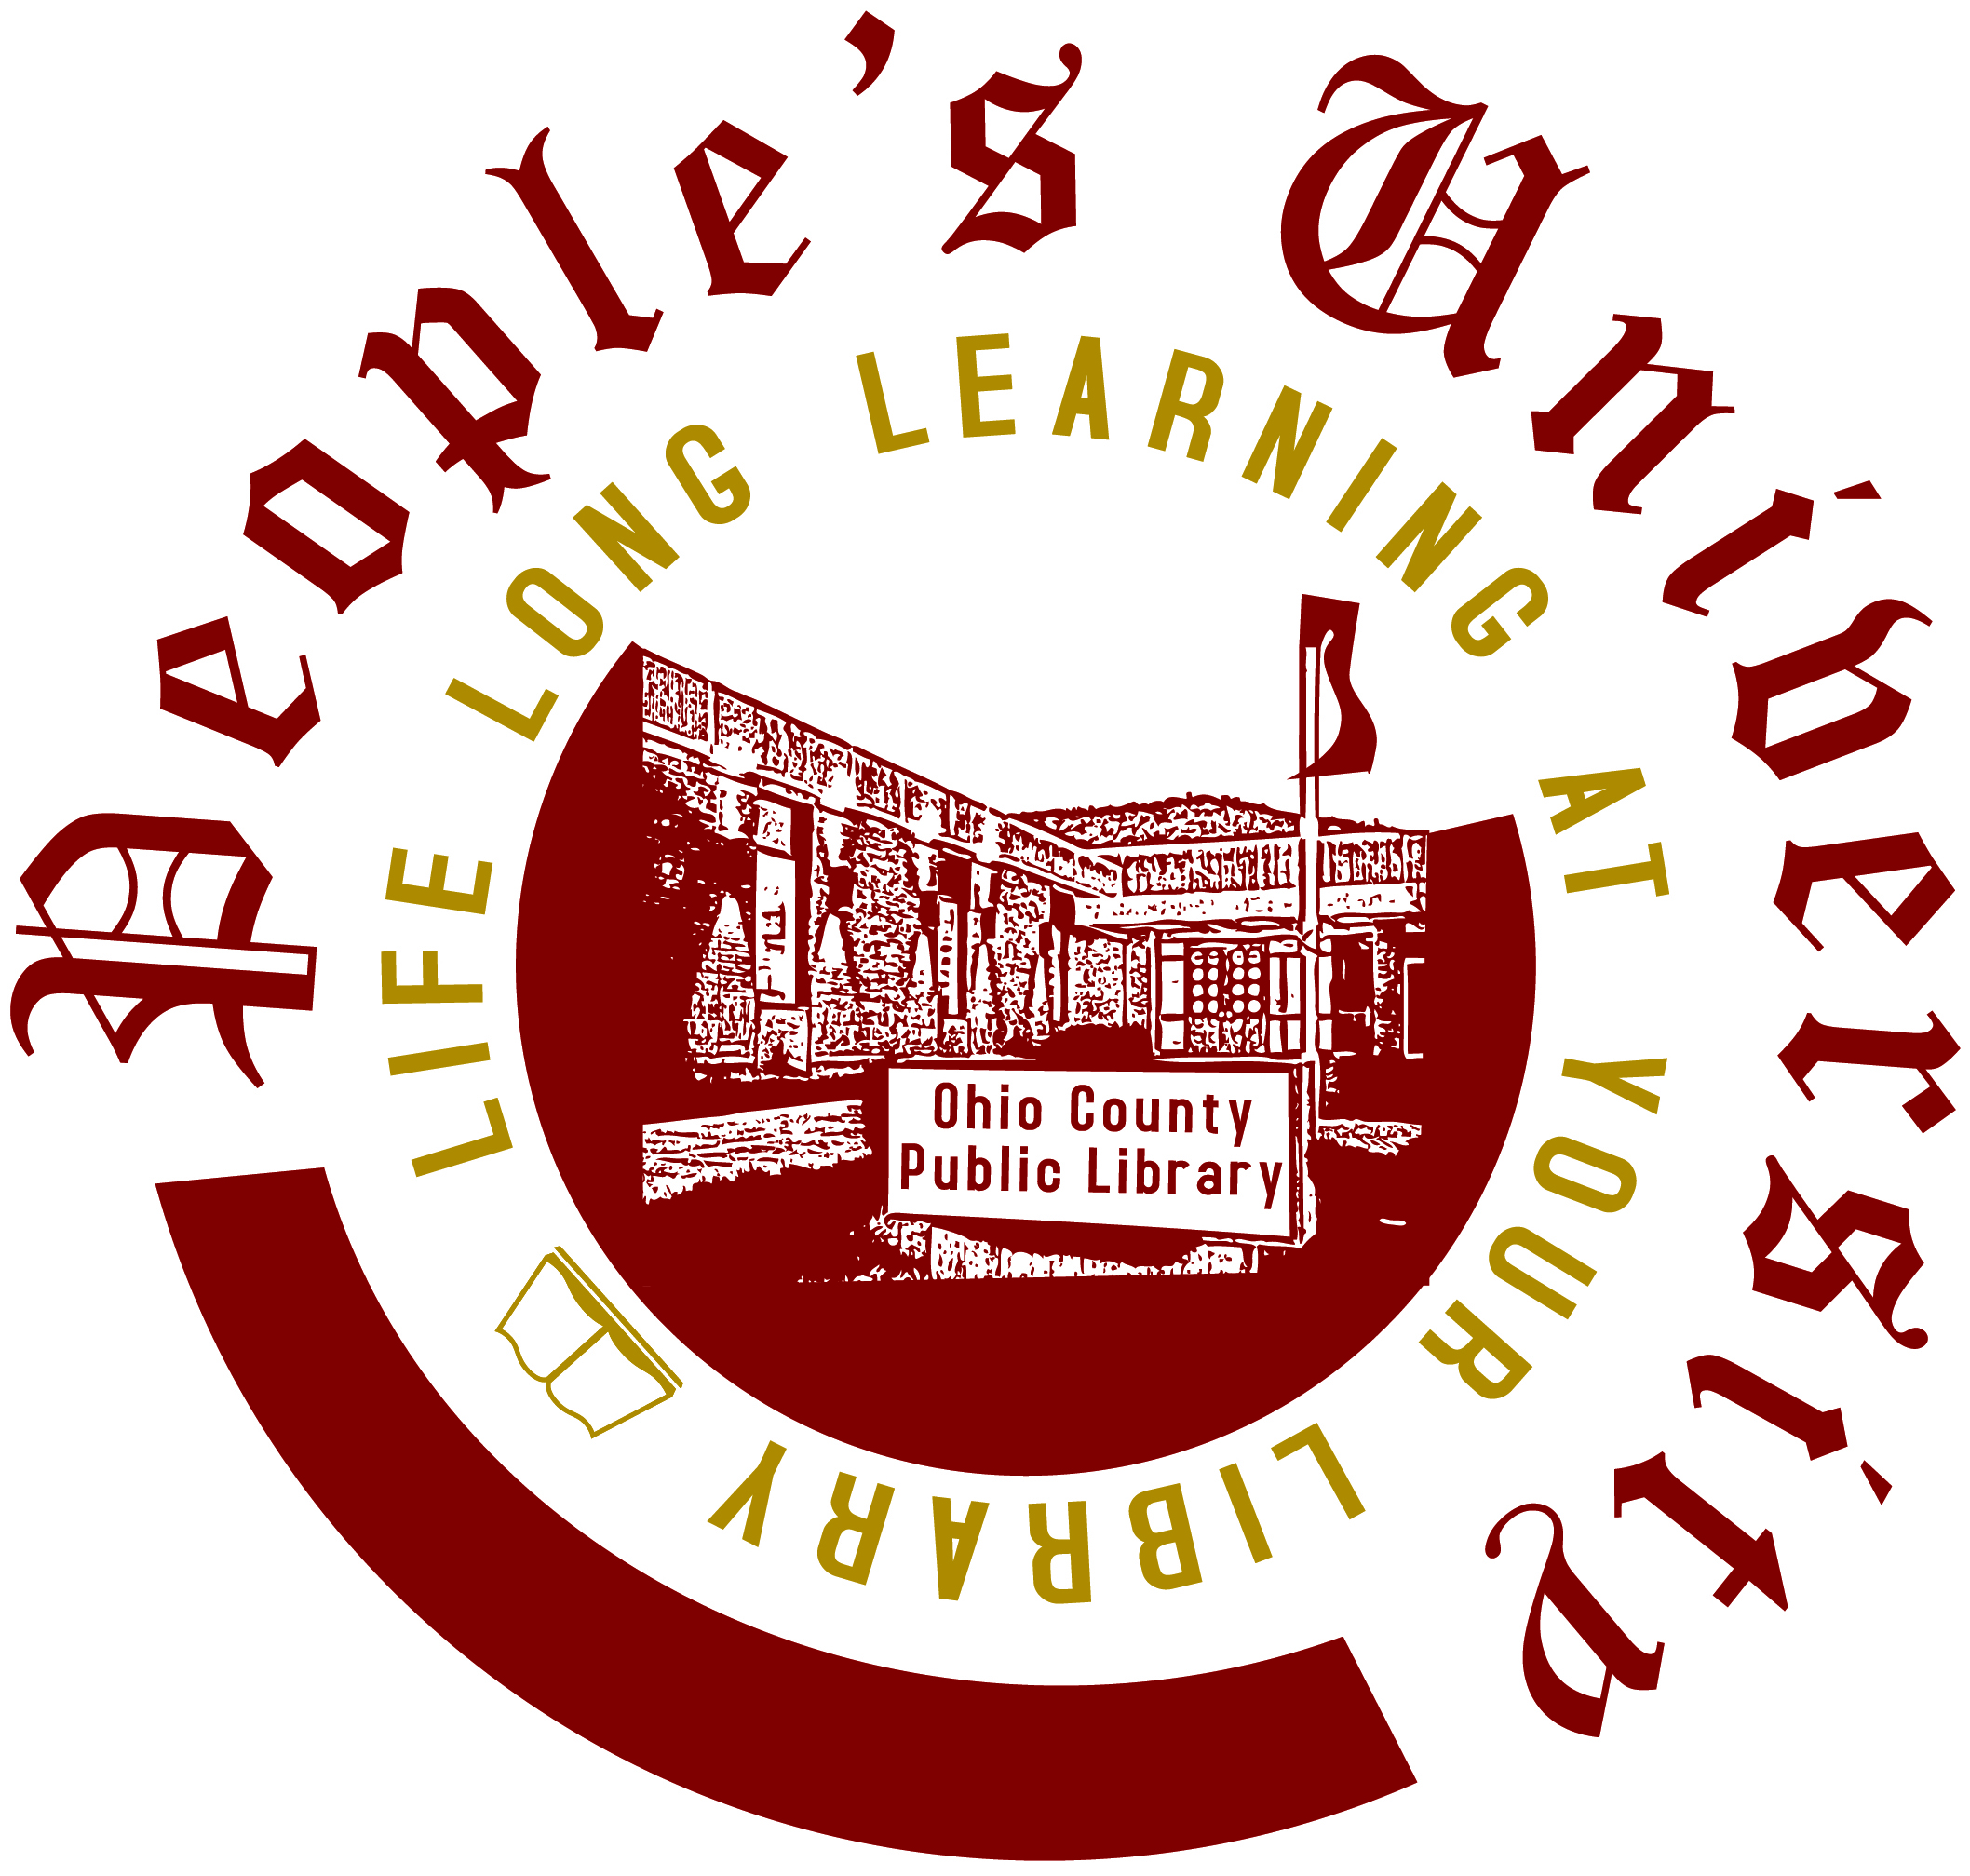 The People's University logo